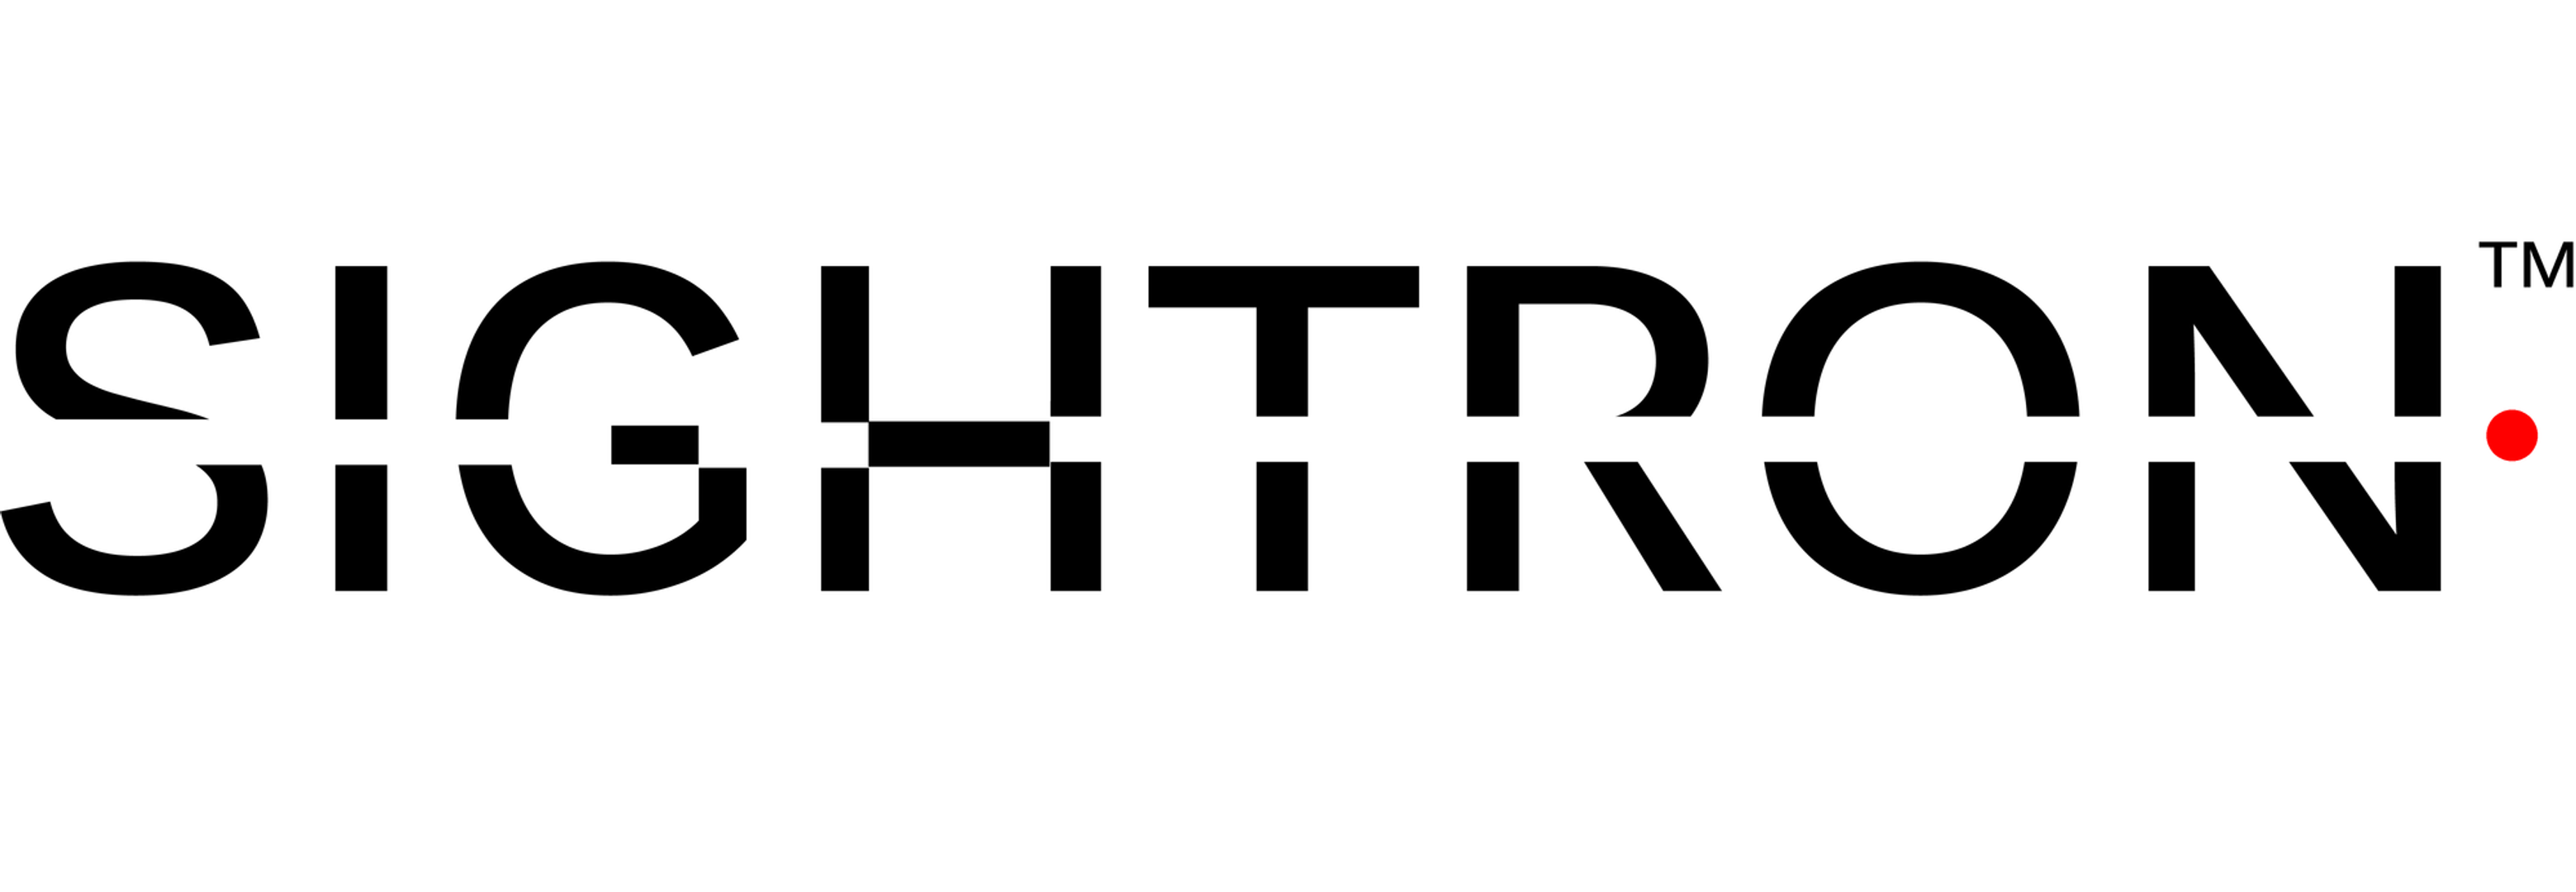 Sightron-logo.png